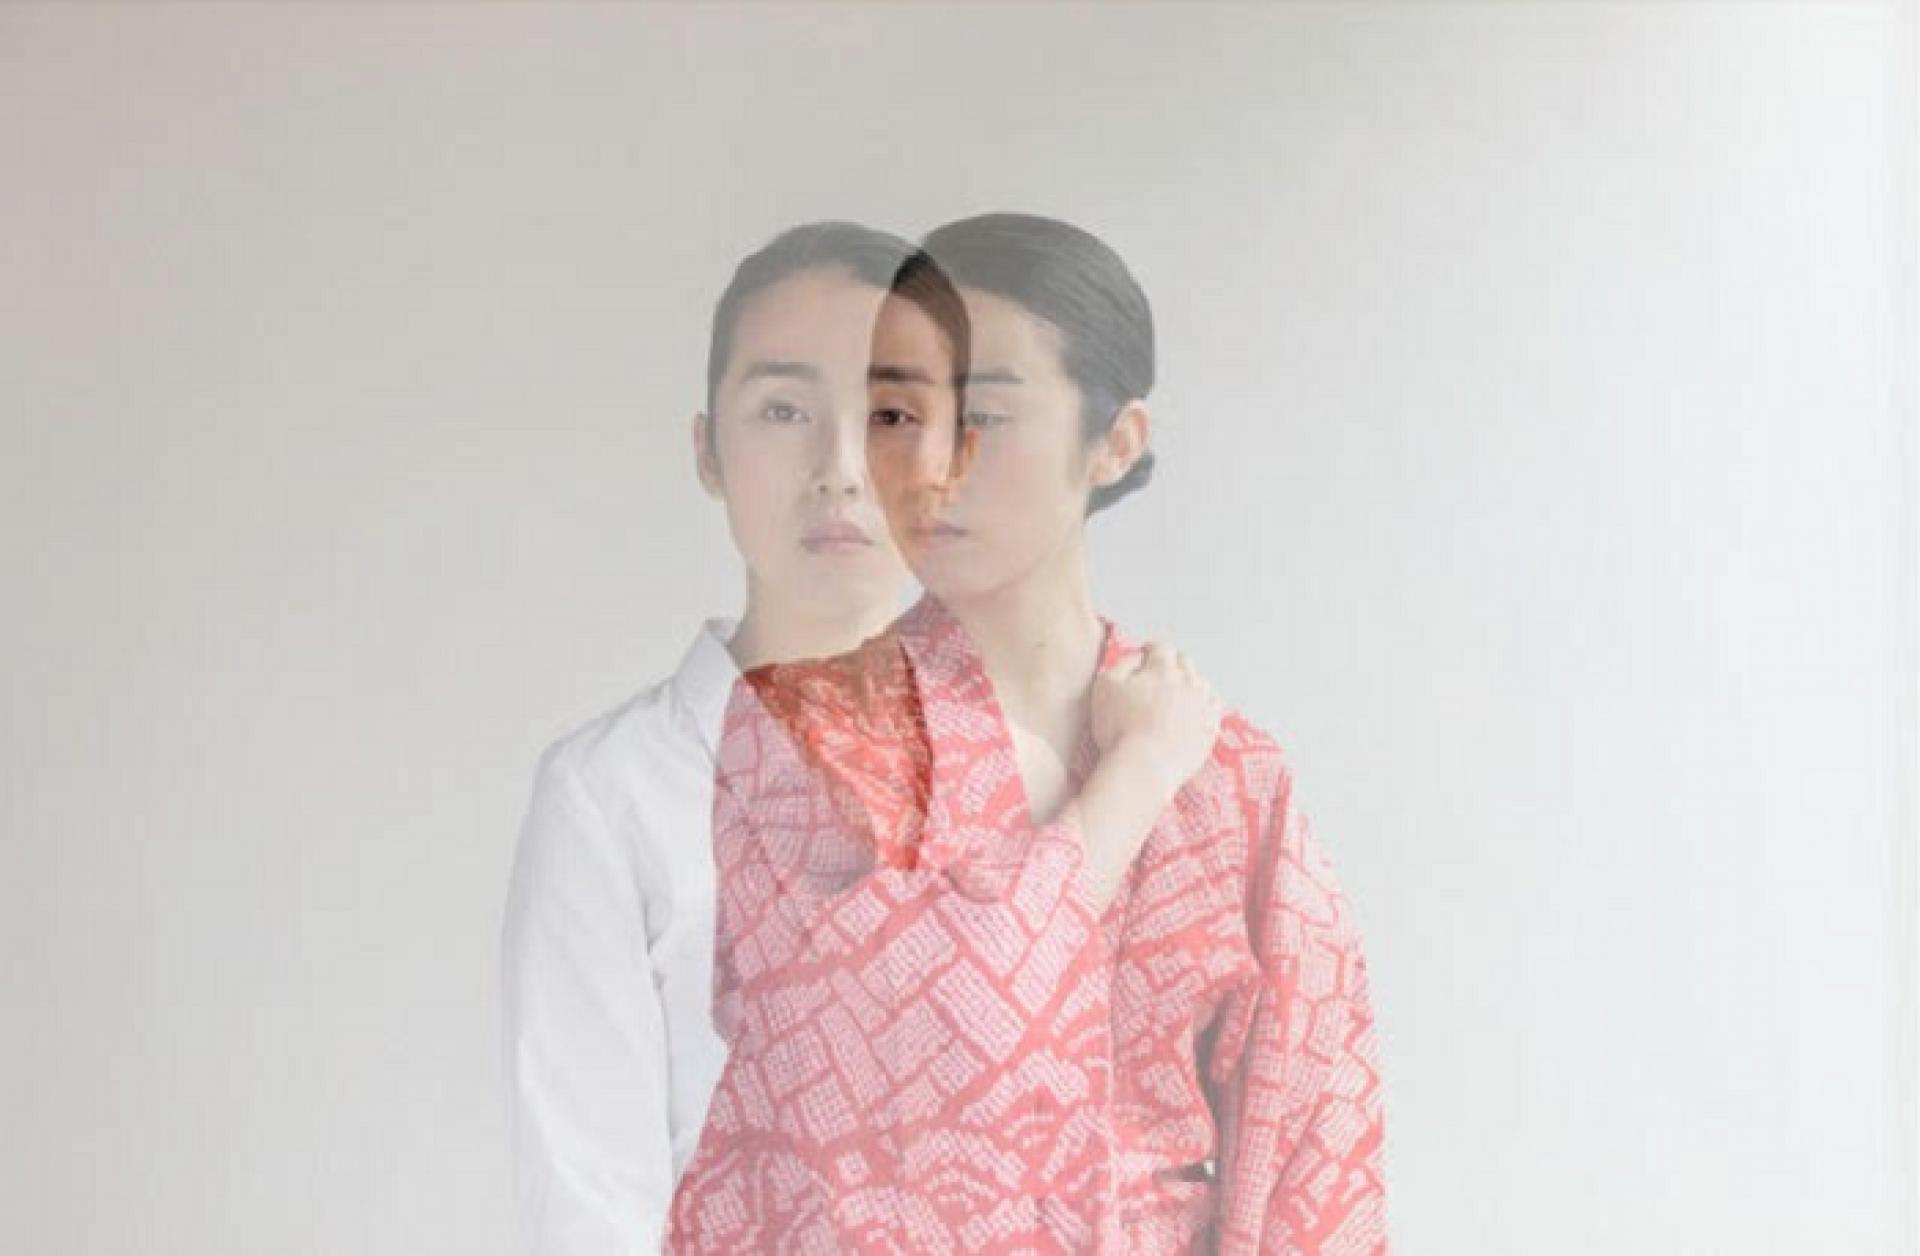 Nieuwe tentoonstelling in Museum No Hero heet 'Women of Japan'